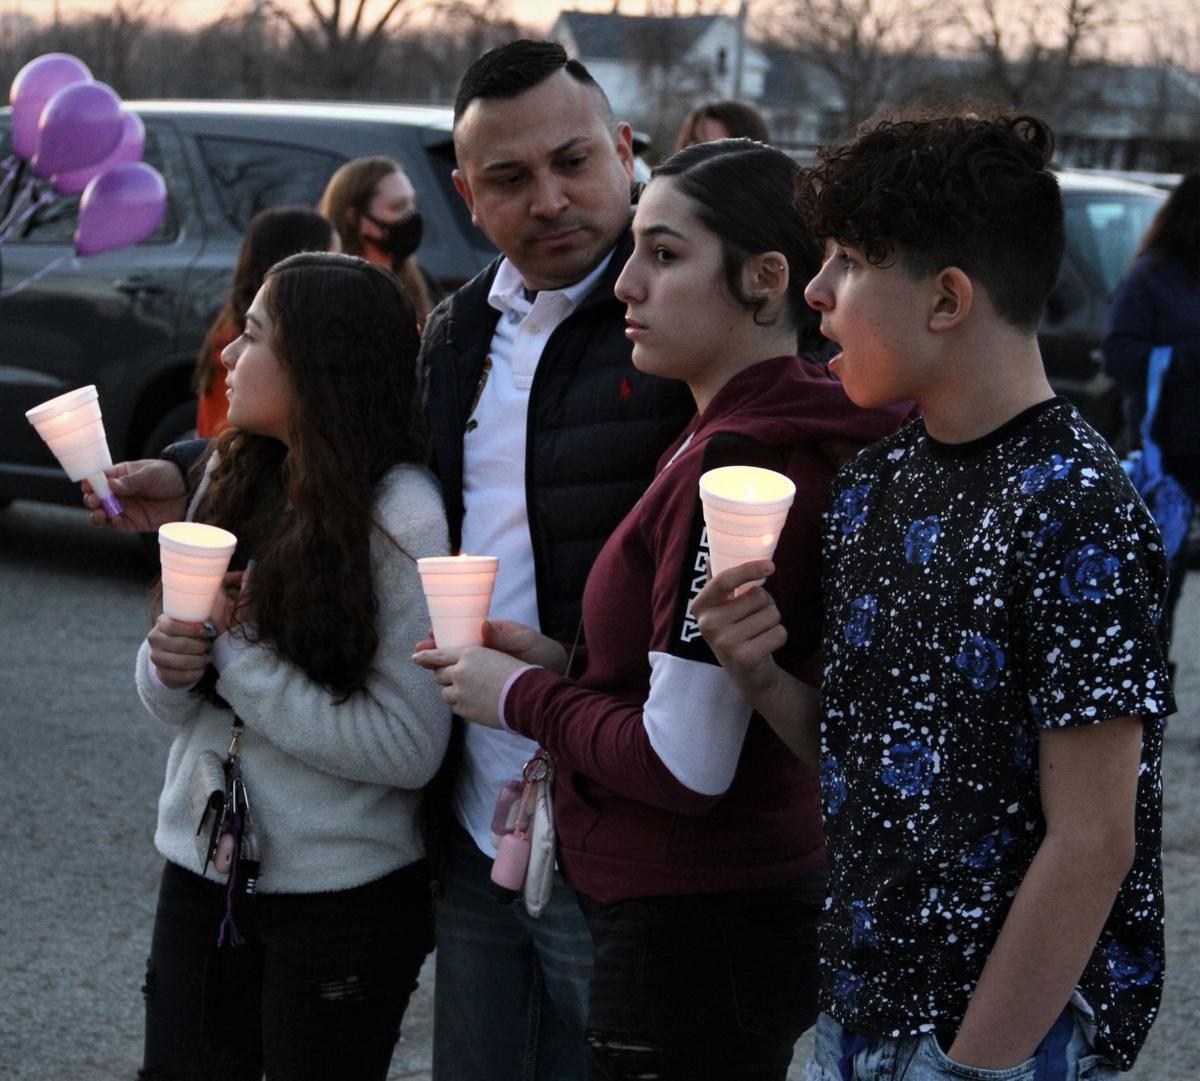 Breasia candlelight vigil 3